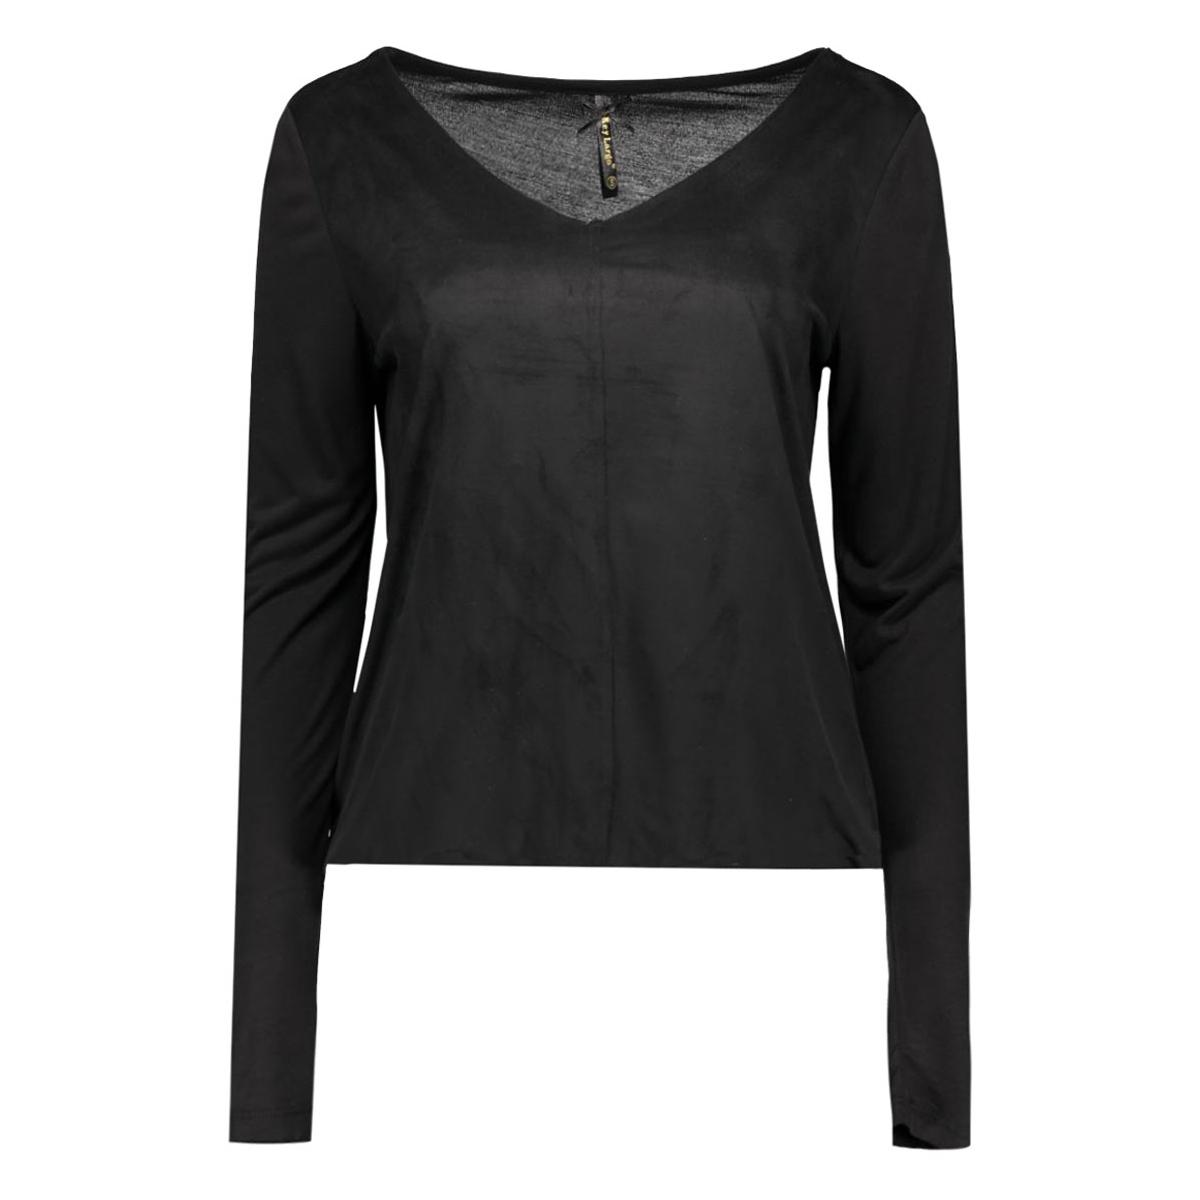 dls00273 key largo t-shirt black